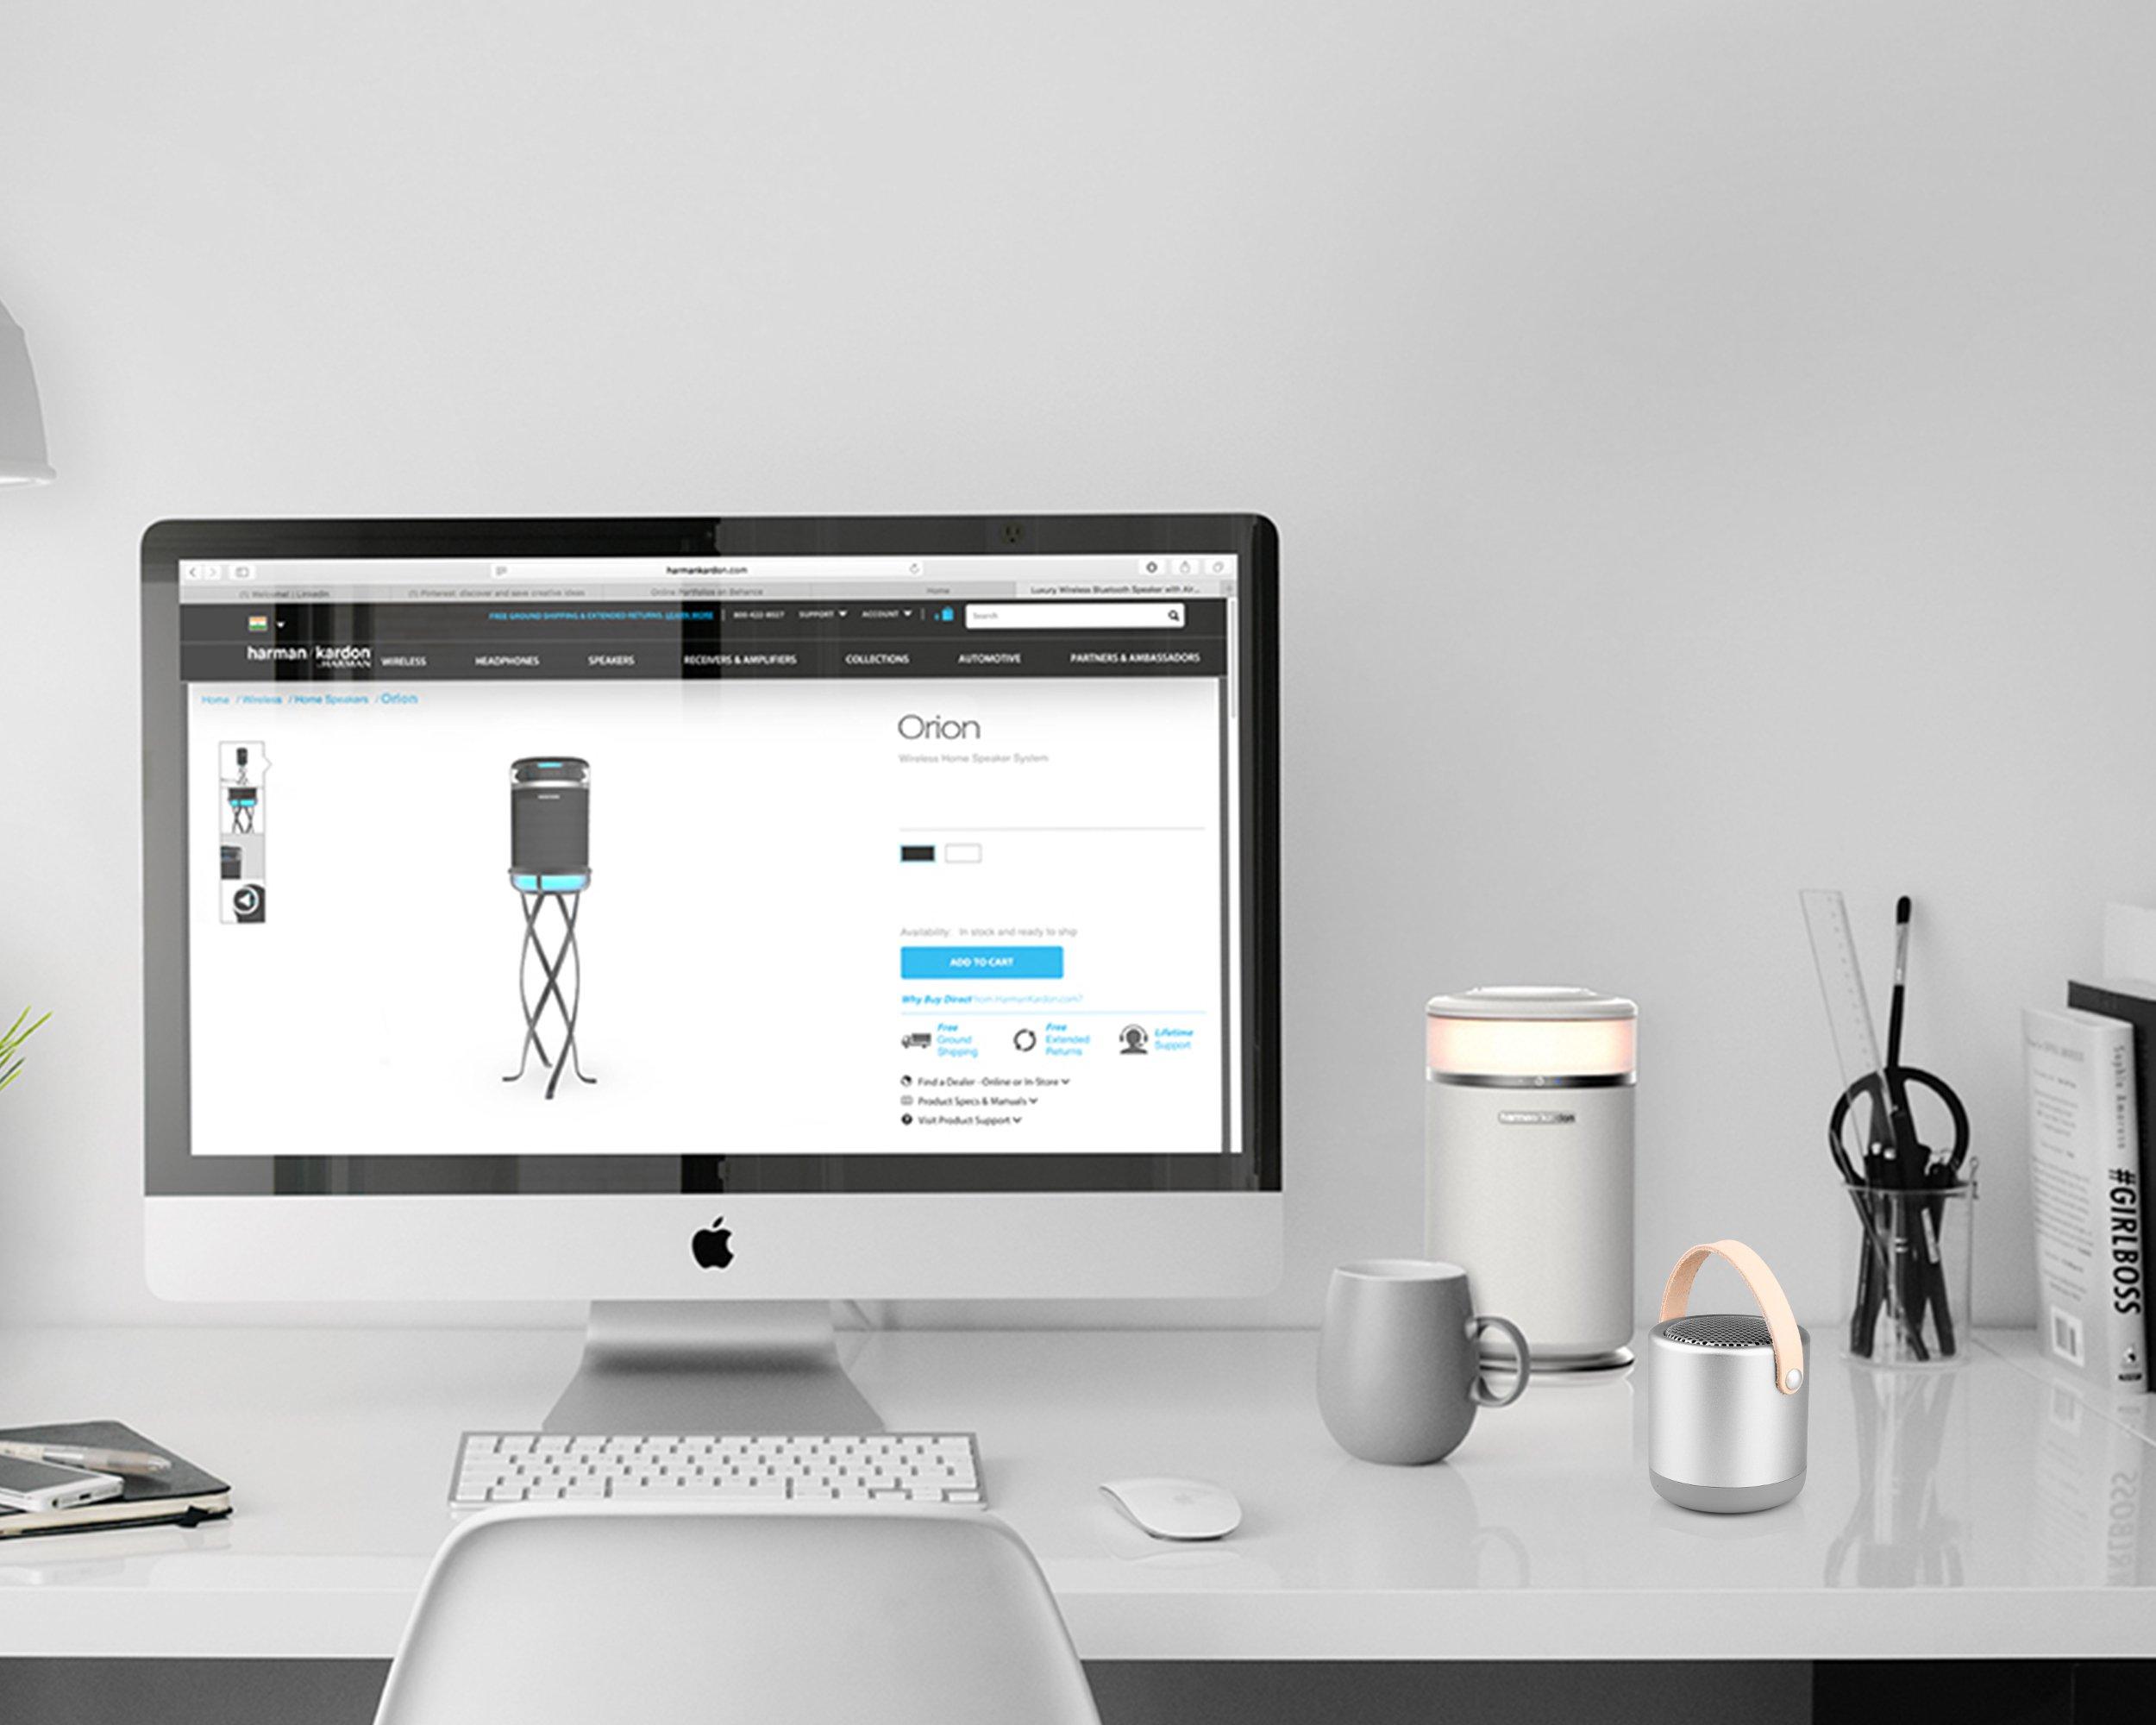 Mini Altoparlante Bluetooth portatile ricaricabile , bluetooth Wireless Speaker con Bassi Potenti per iPhone , iPad, iPod , Samsung , smartphone, tablet PC, laptop , Ultrabook